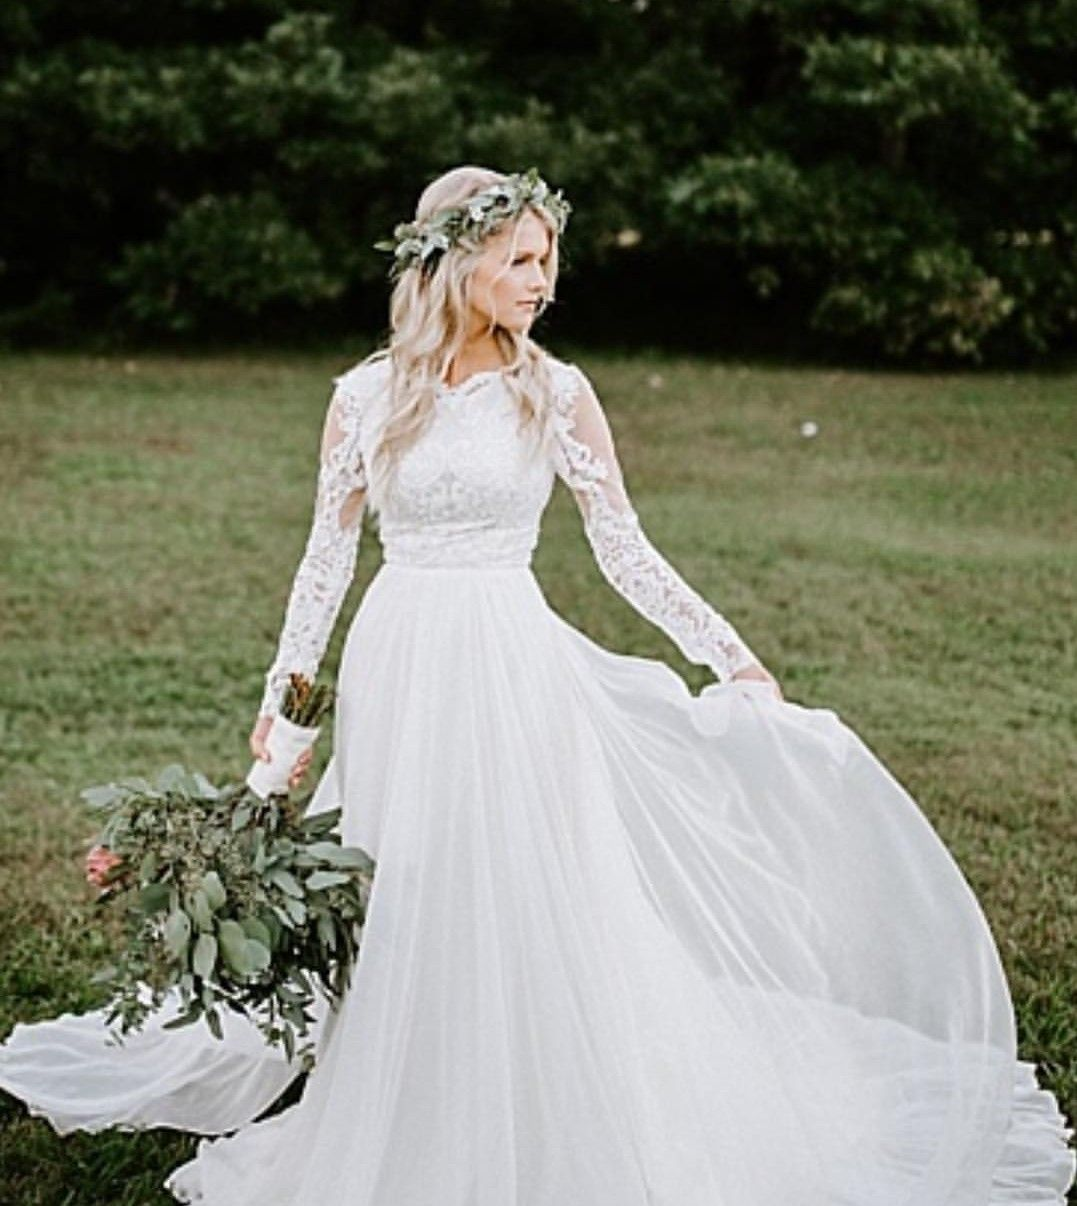 Josie Balka in her wedding dress Duggar wedding, Wedding